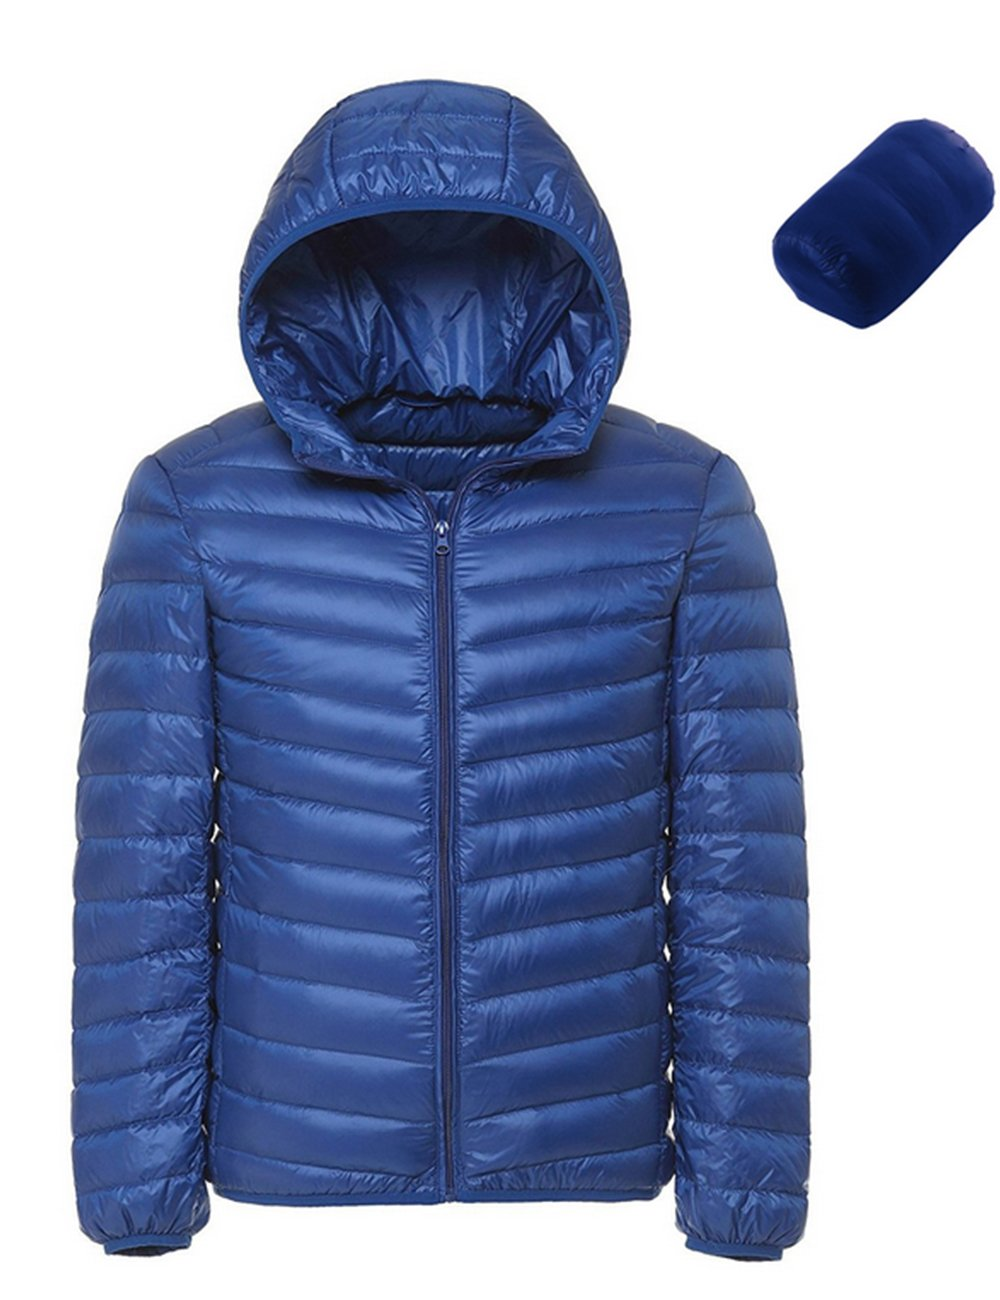 8209803da5b340 Men s Winter Hooded Packable Down Lightweight Jacket NT0905 product image